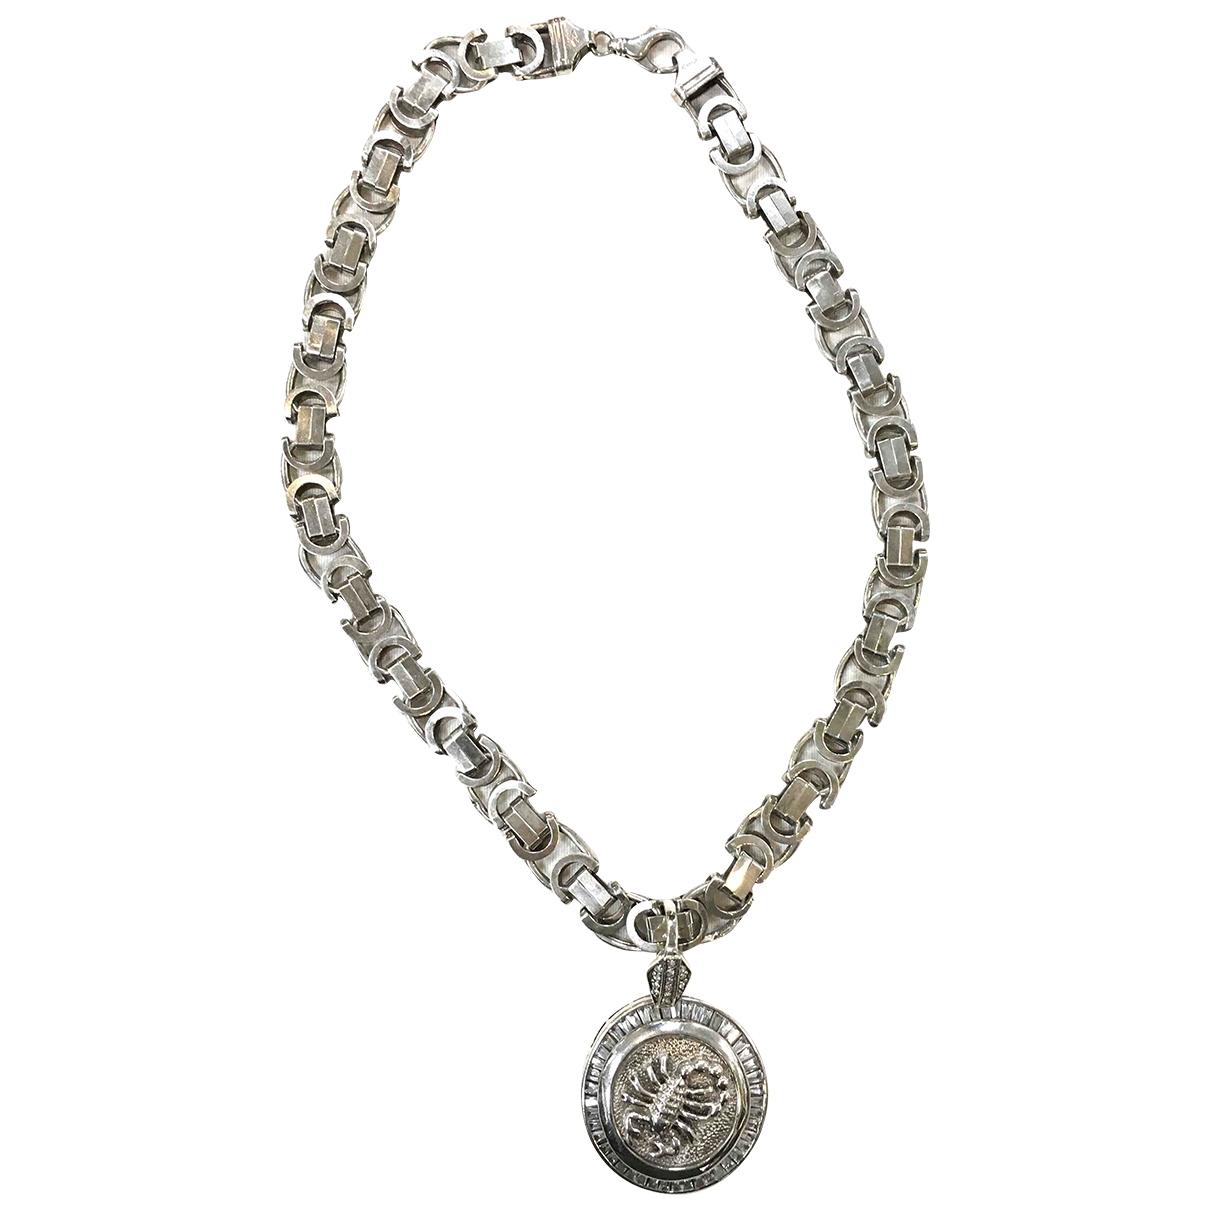 Non Signe / Unsigned Medailles Schmuckstuecke in  Silber Silber